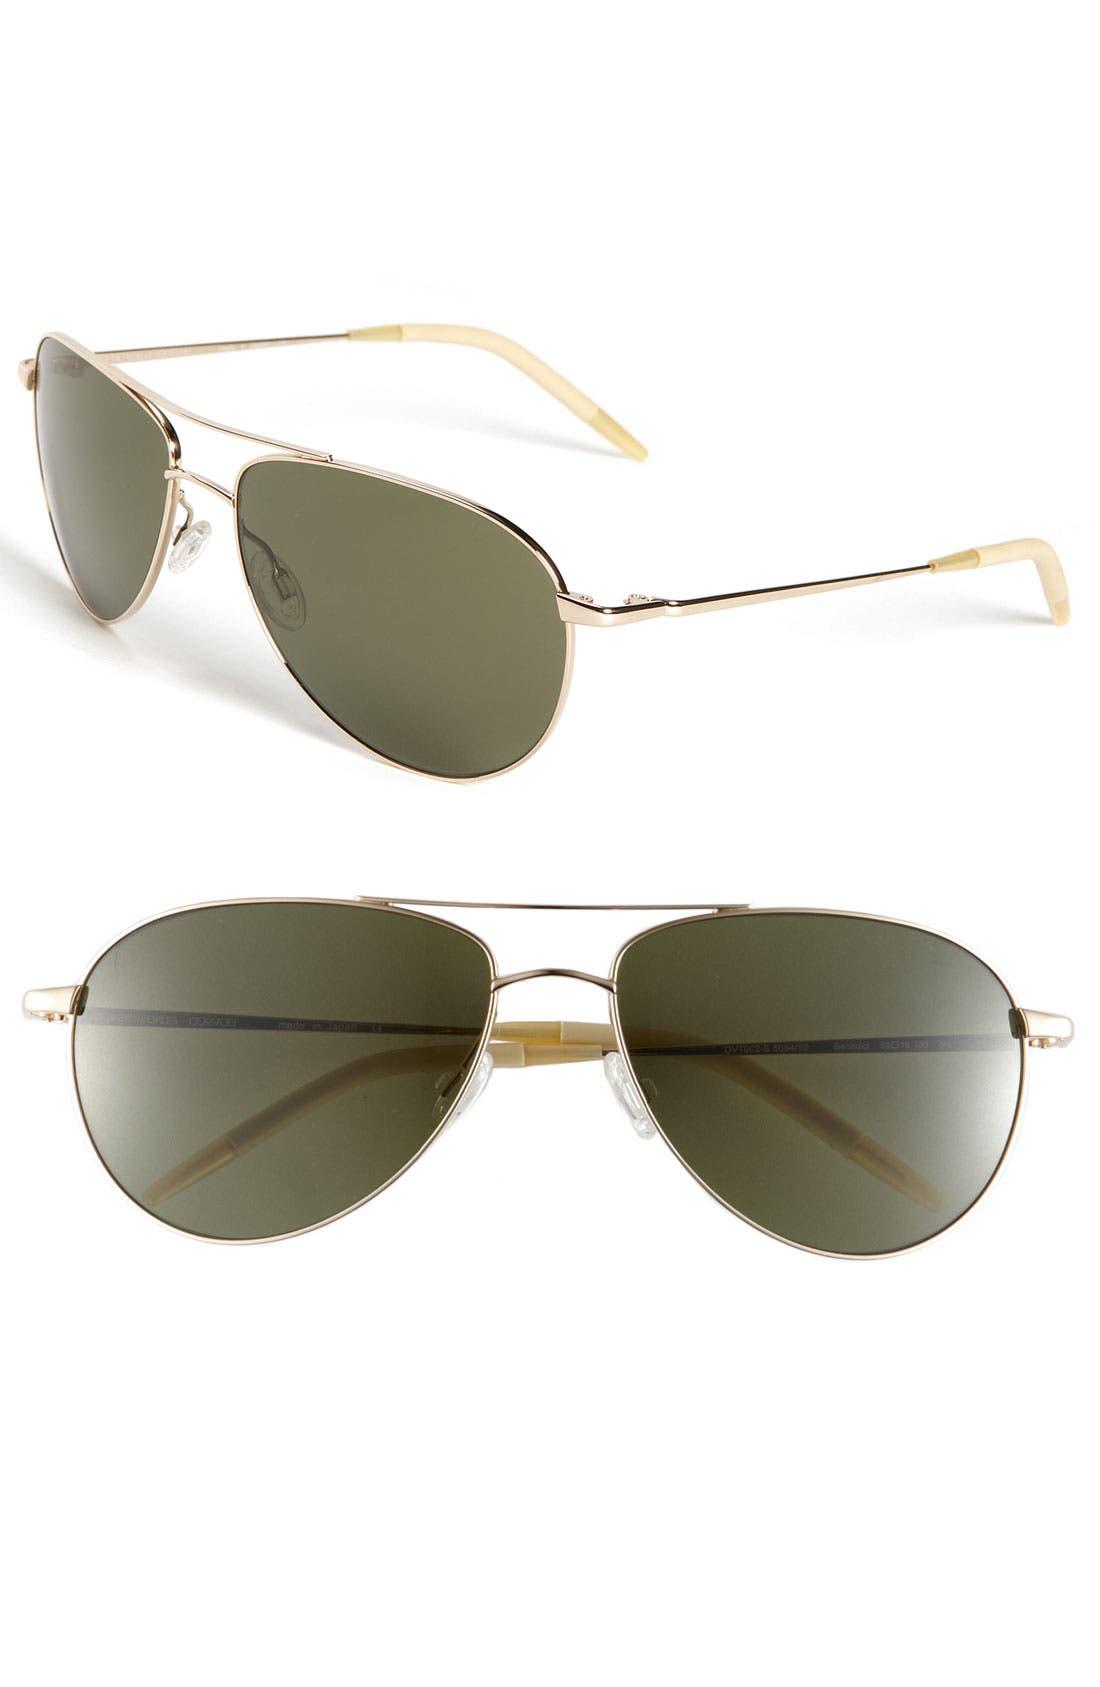 Oliver Peoples 'Benedict' 59mm Aviator Sunglasses (Regular Retail Price: $350.00)